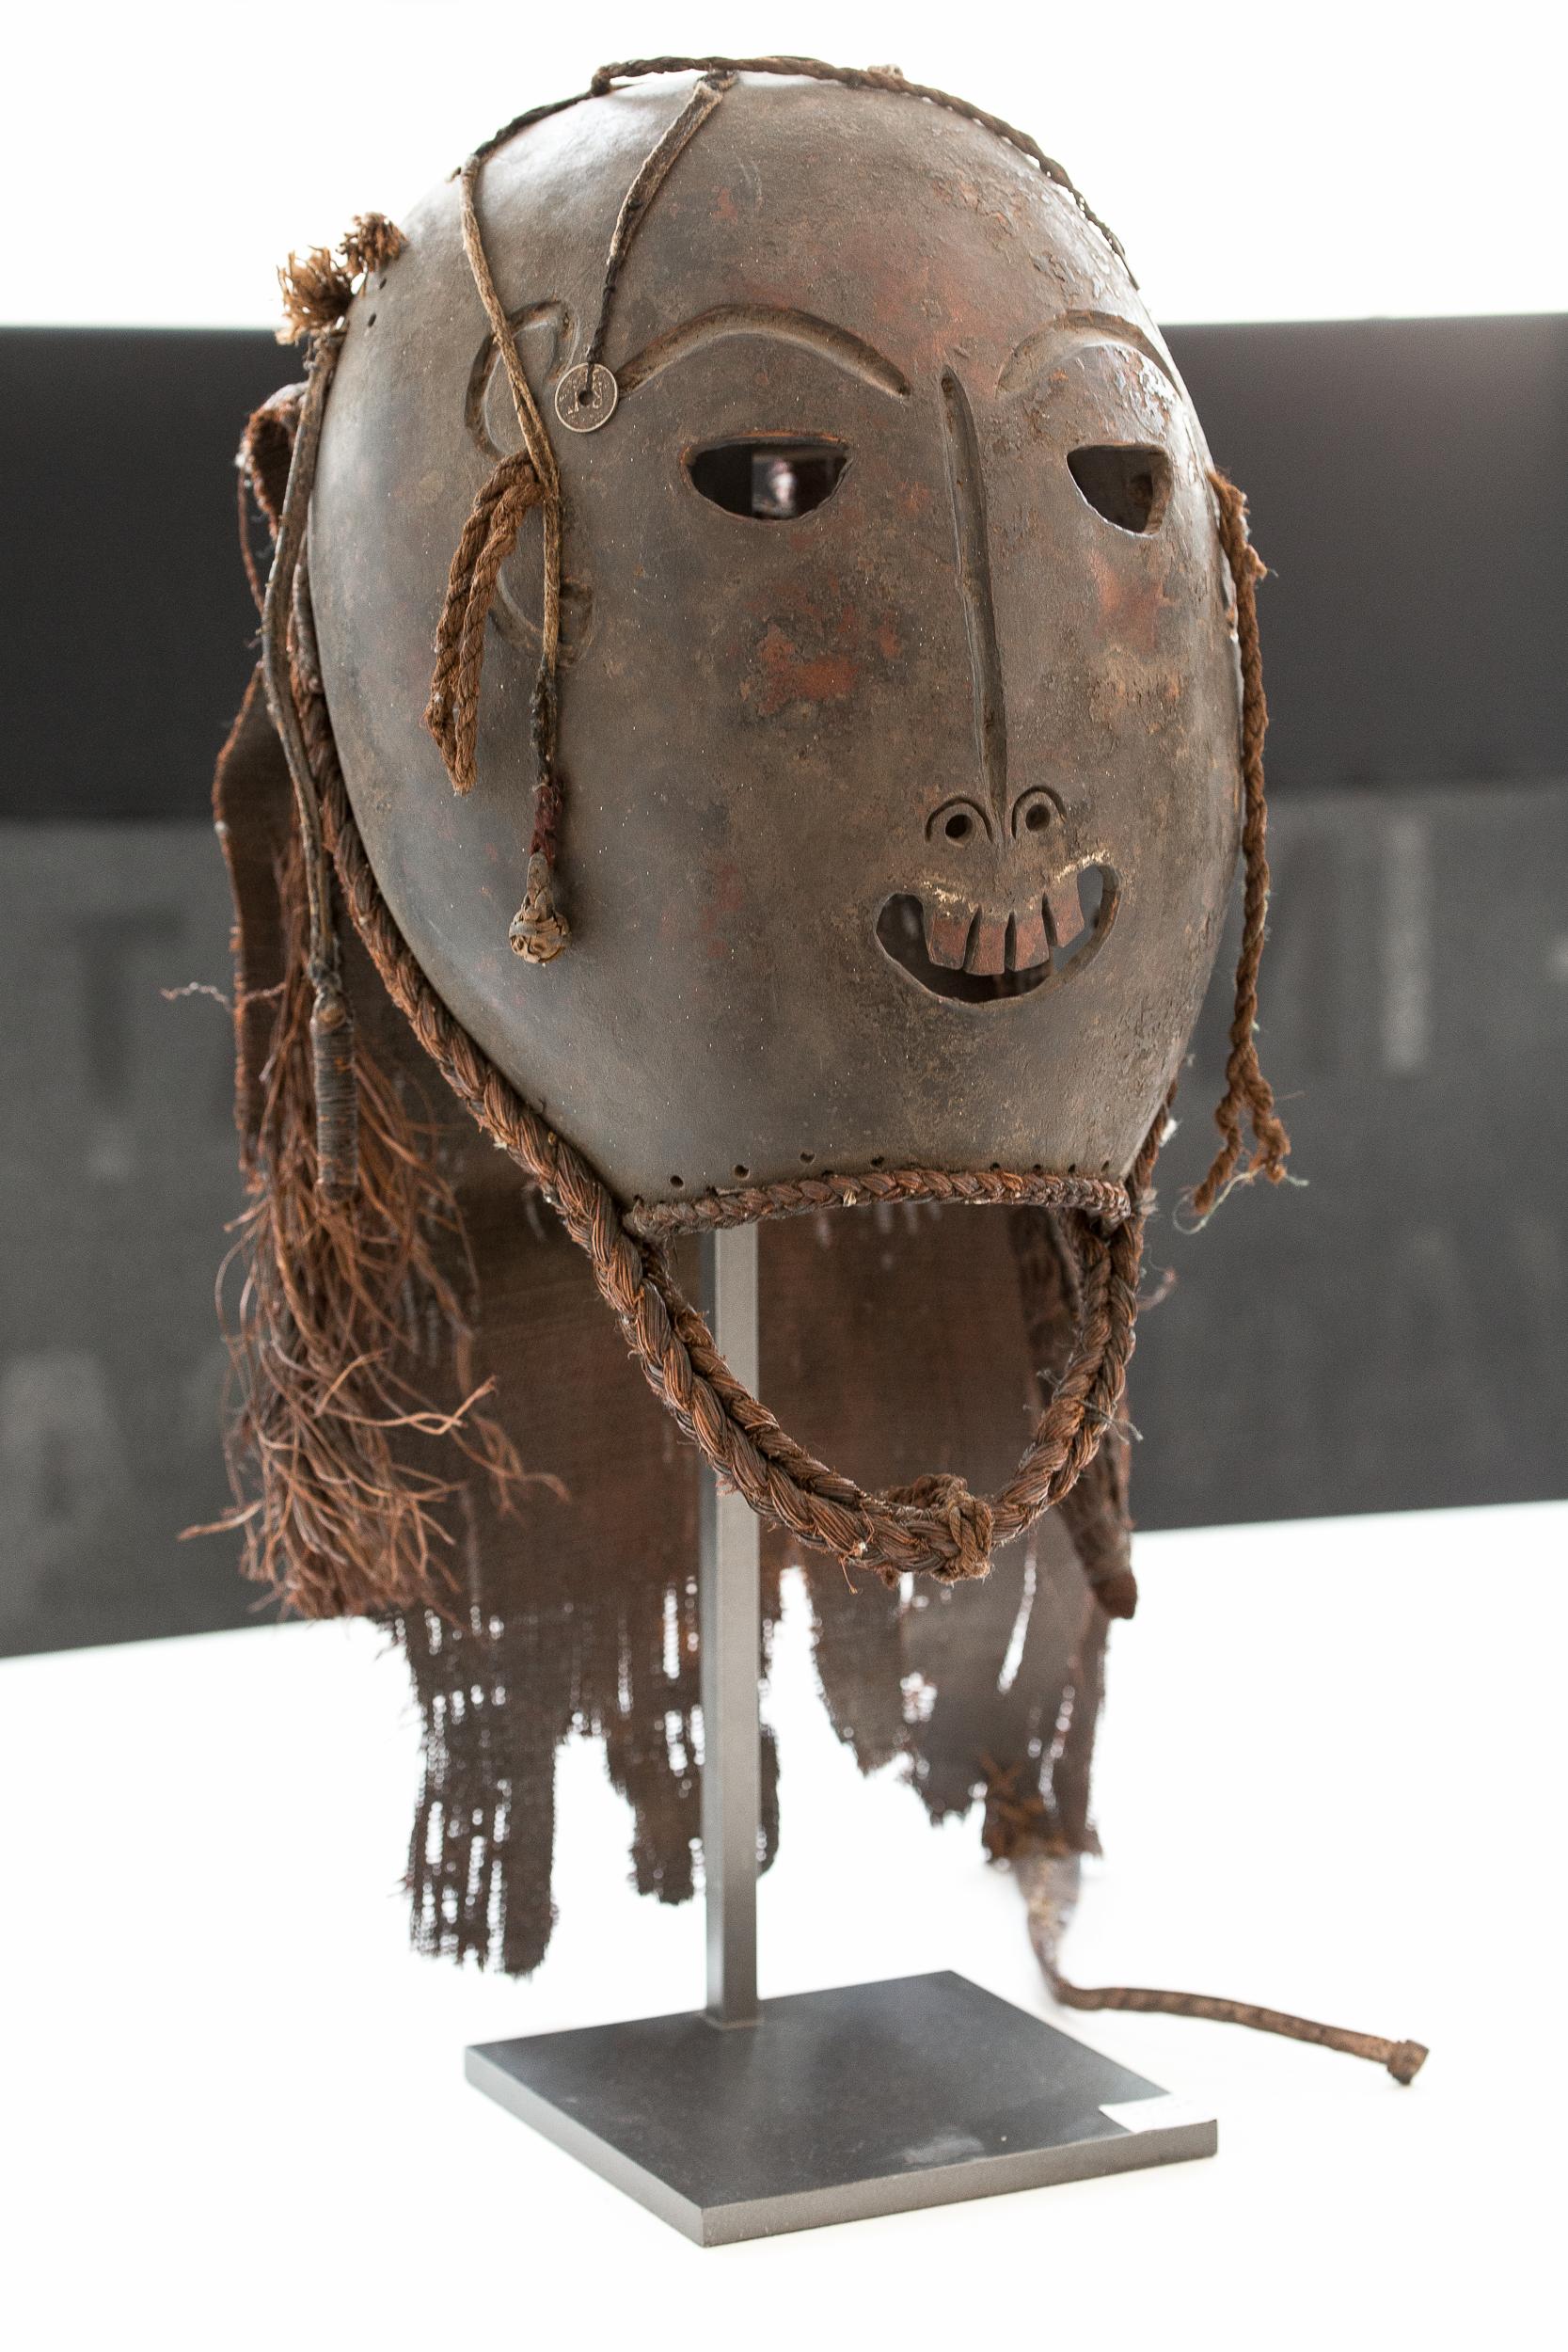 tribal-art-oostende-ostende-exposition-galerie-lz-art-africain-belgique-4.jpg